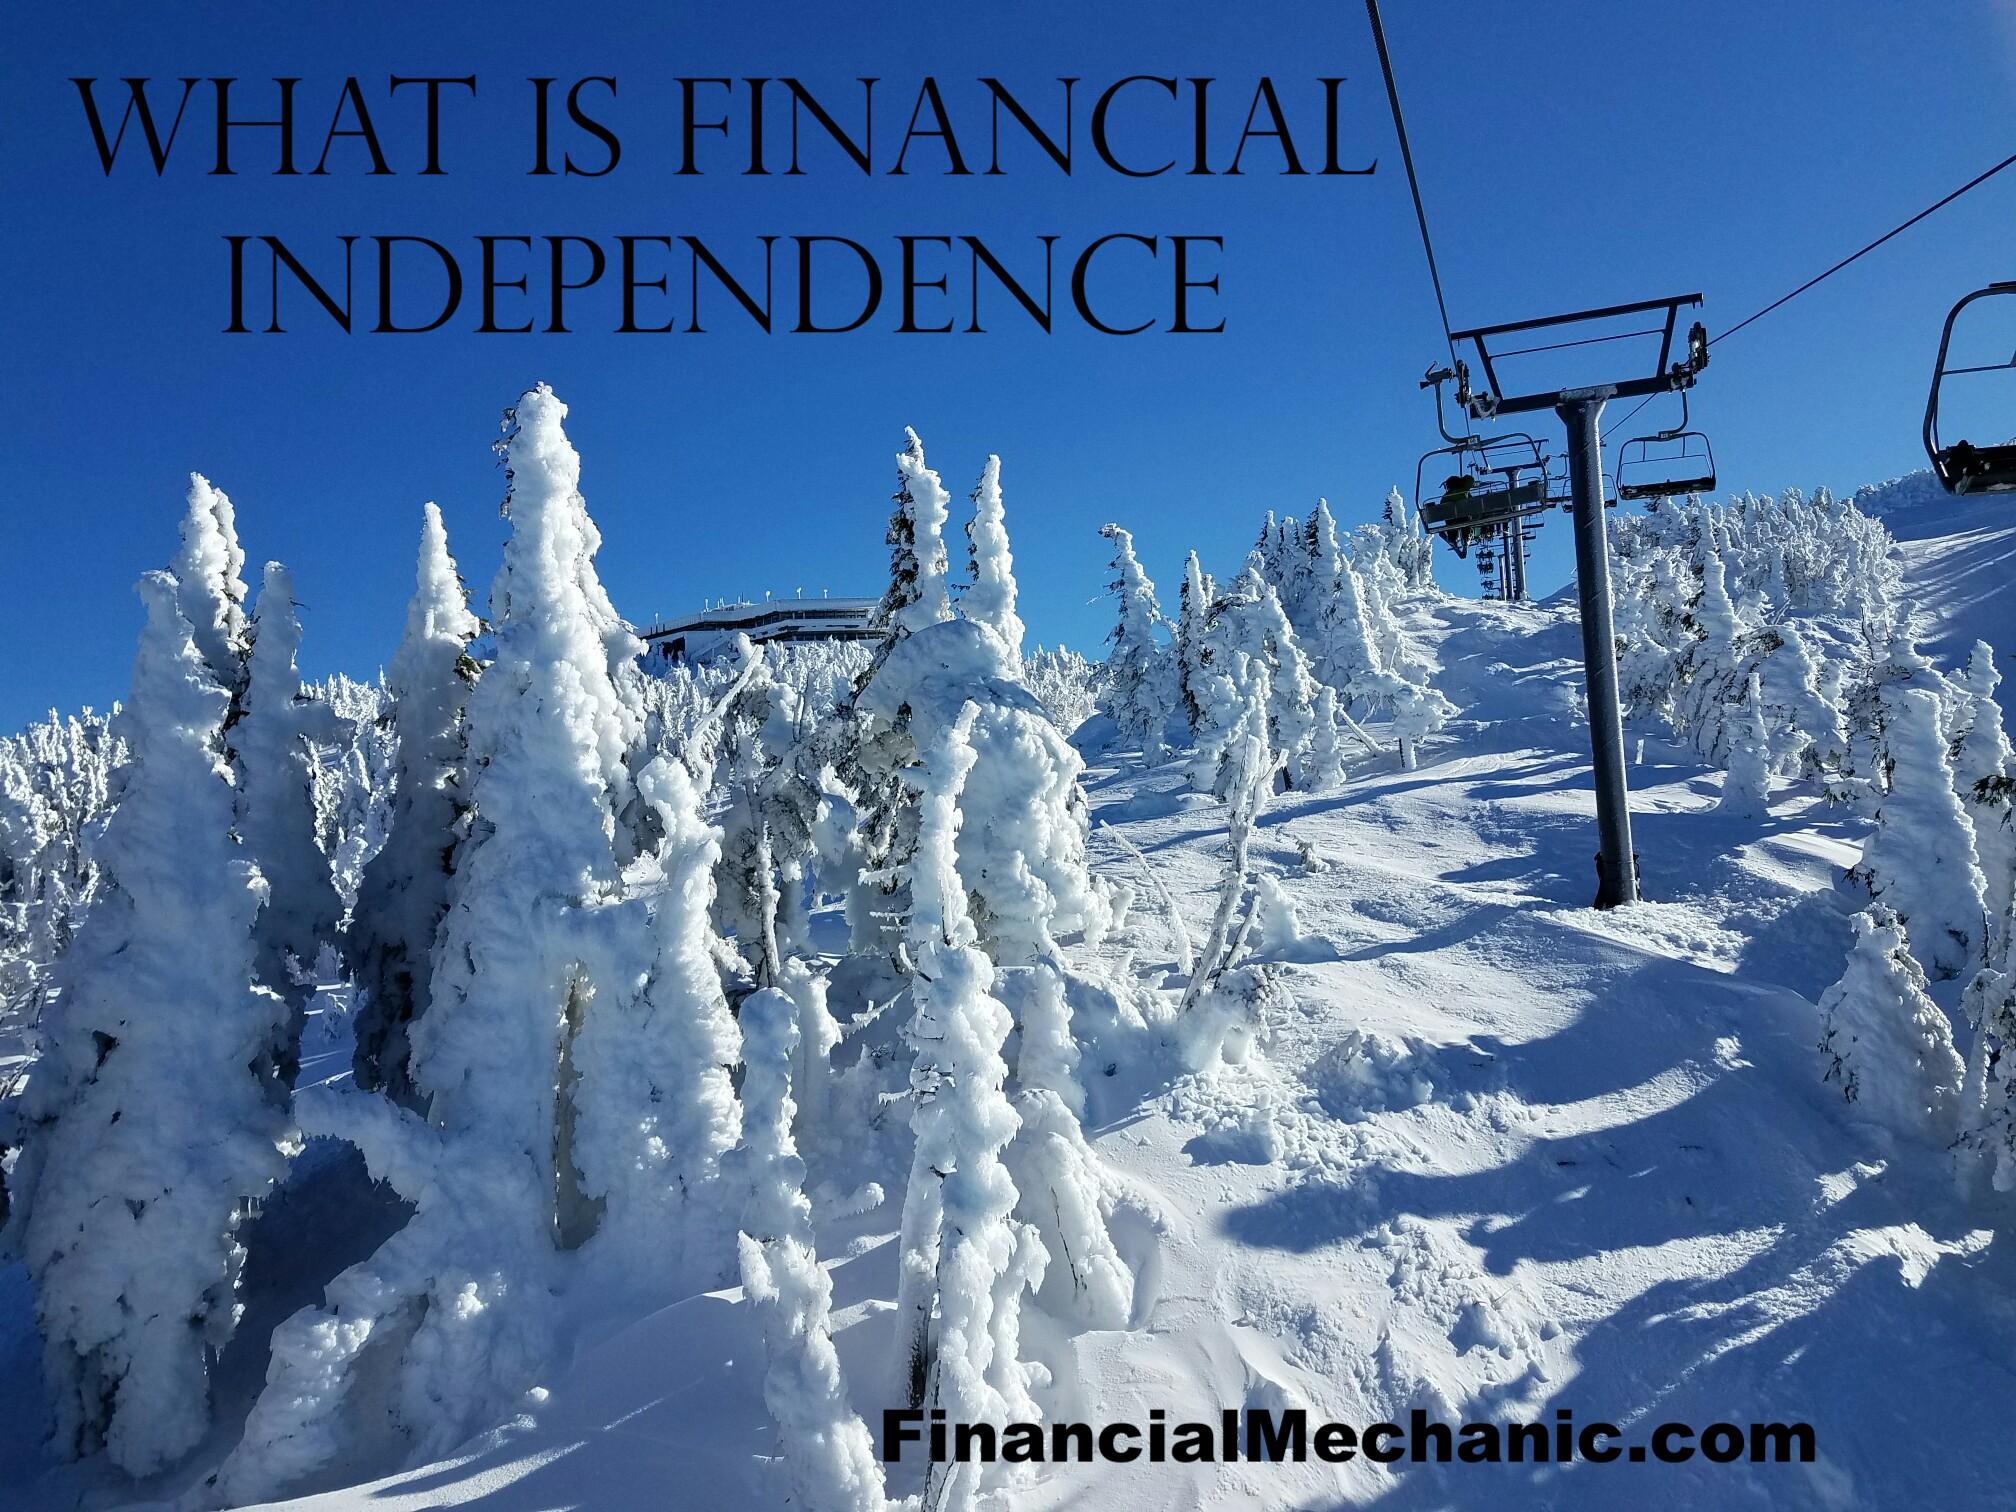 blog-whatisfinancialindependence.jpg